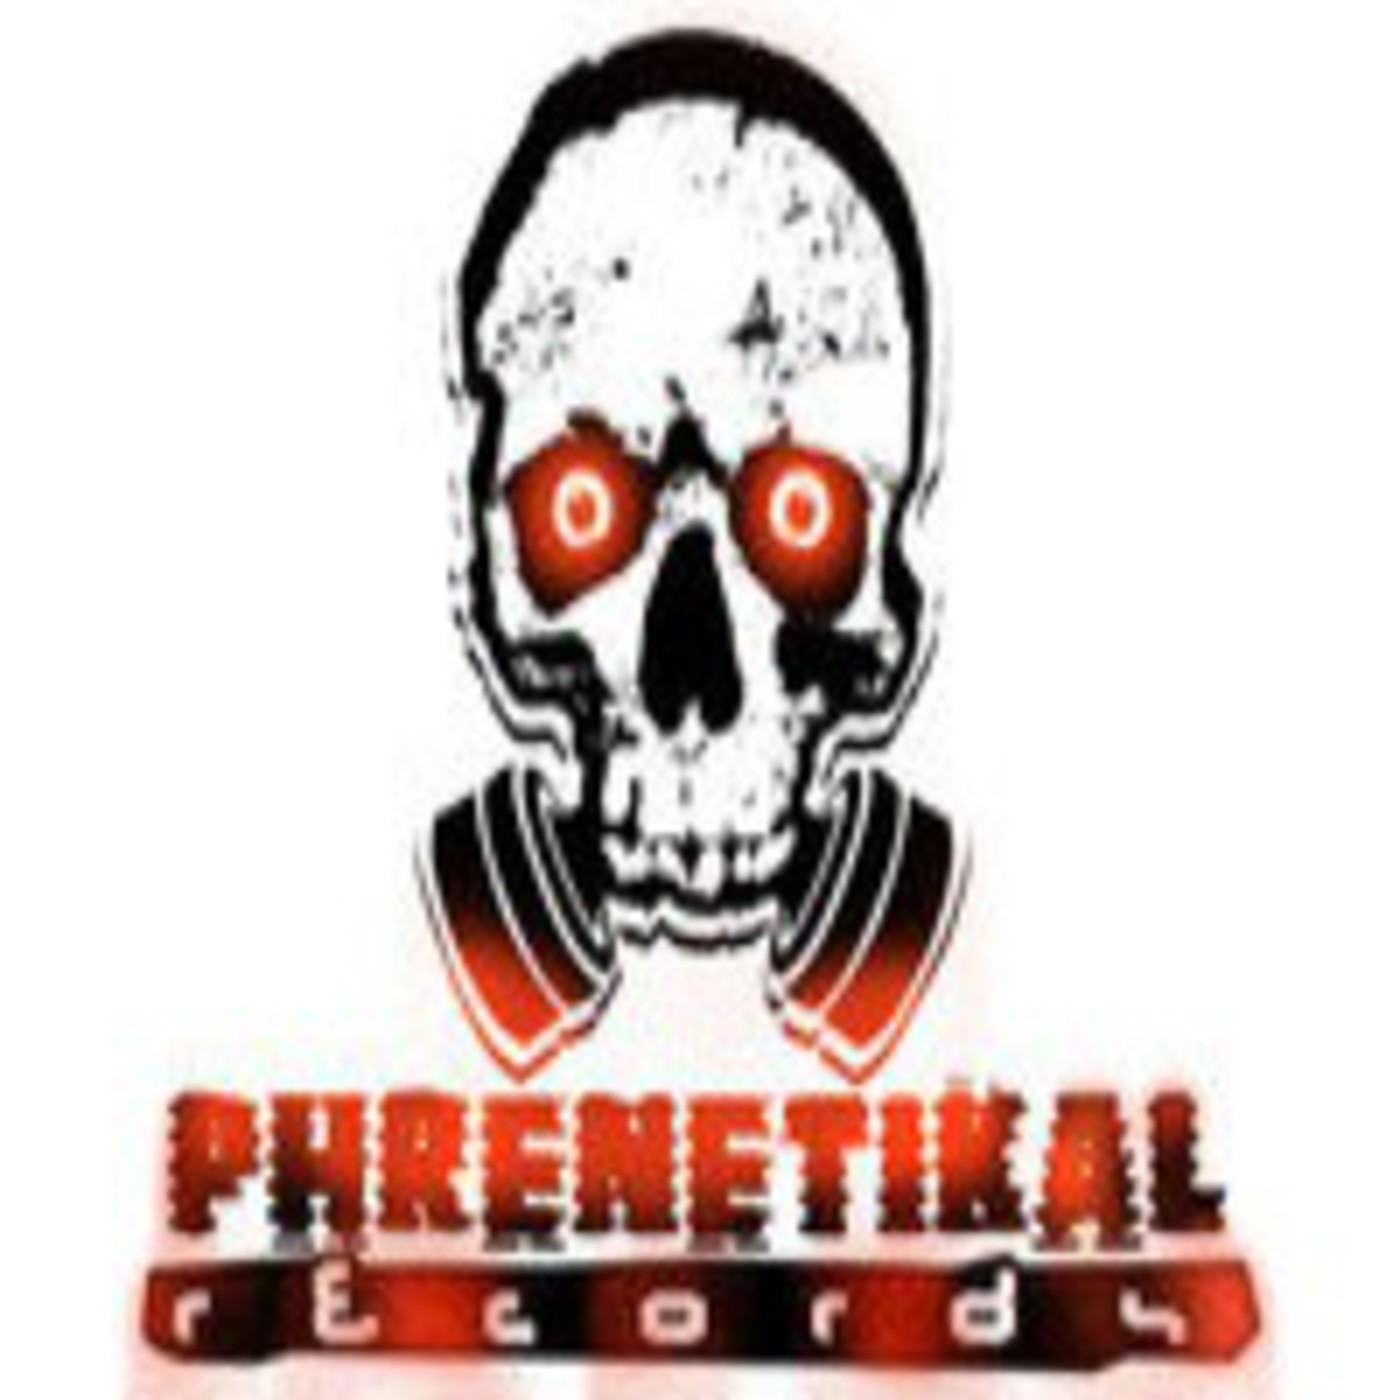 <![CDATA[Podcast Phrenetikal Frequency]]>